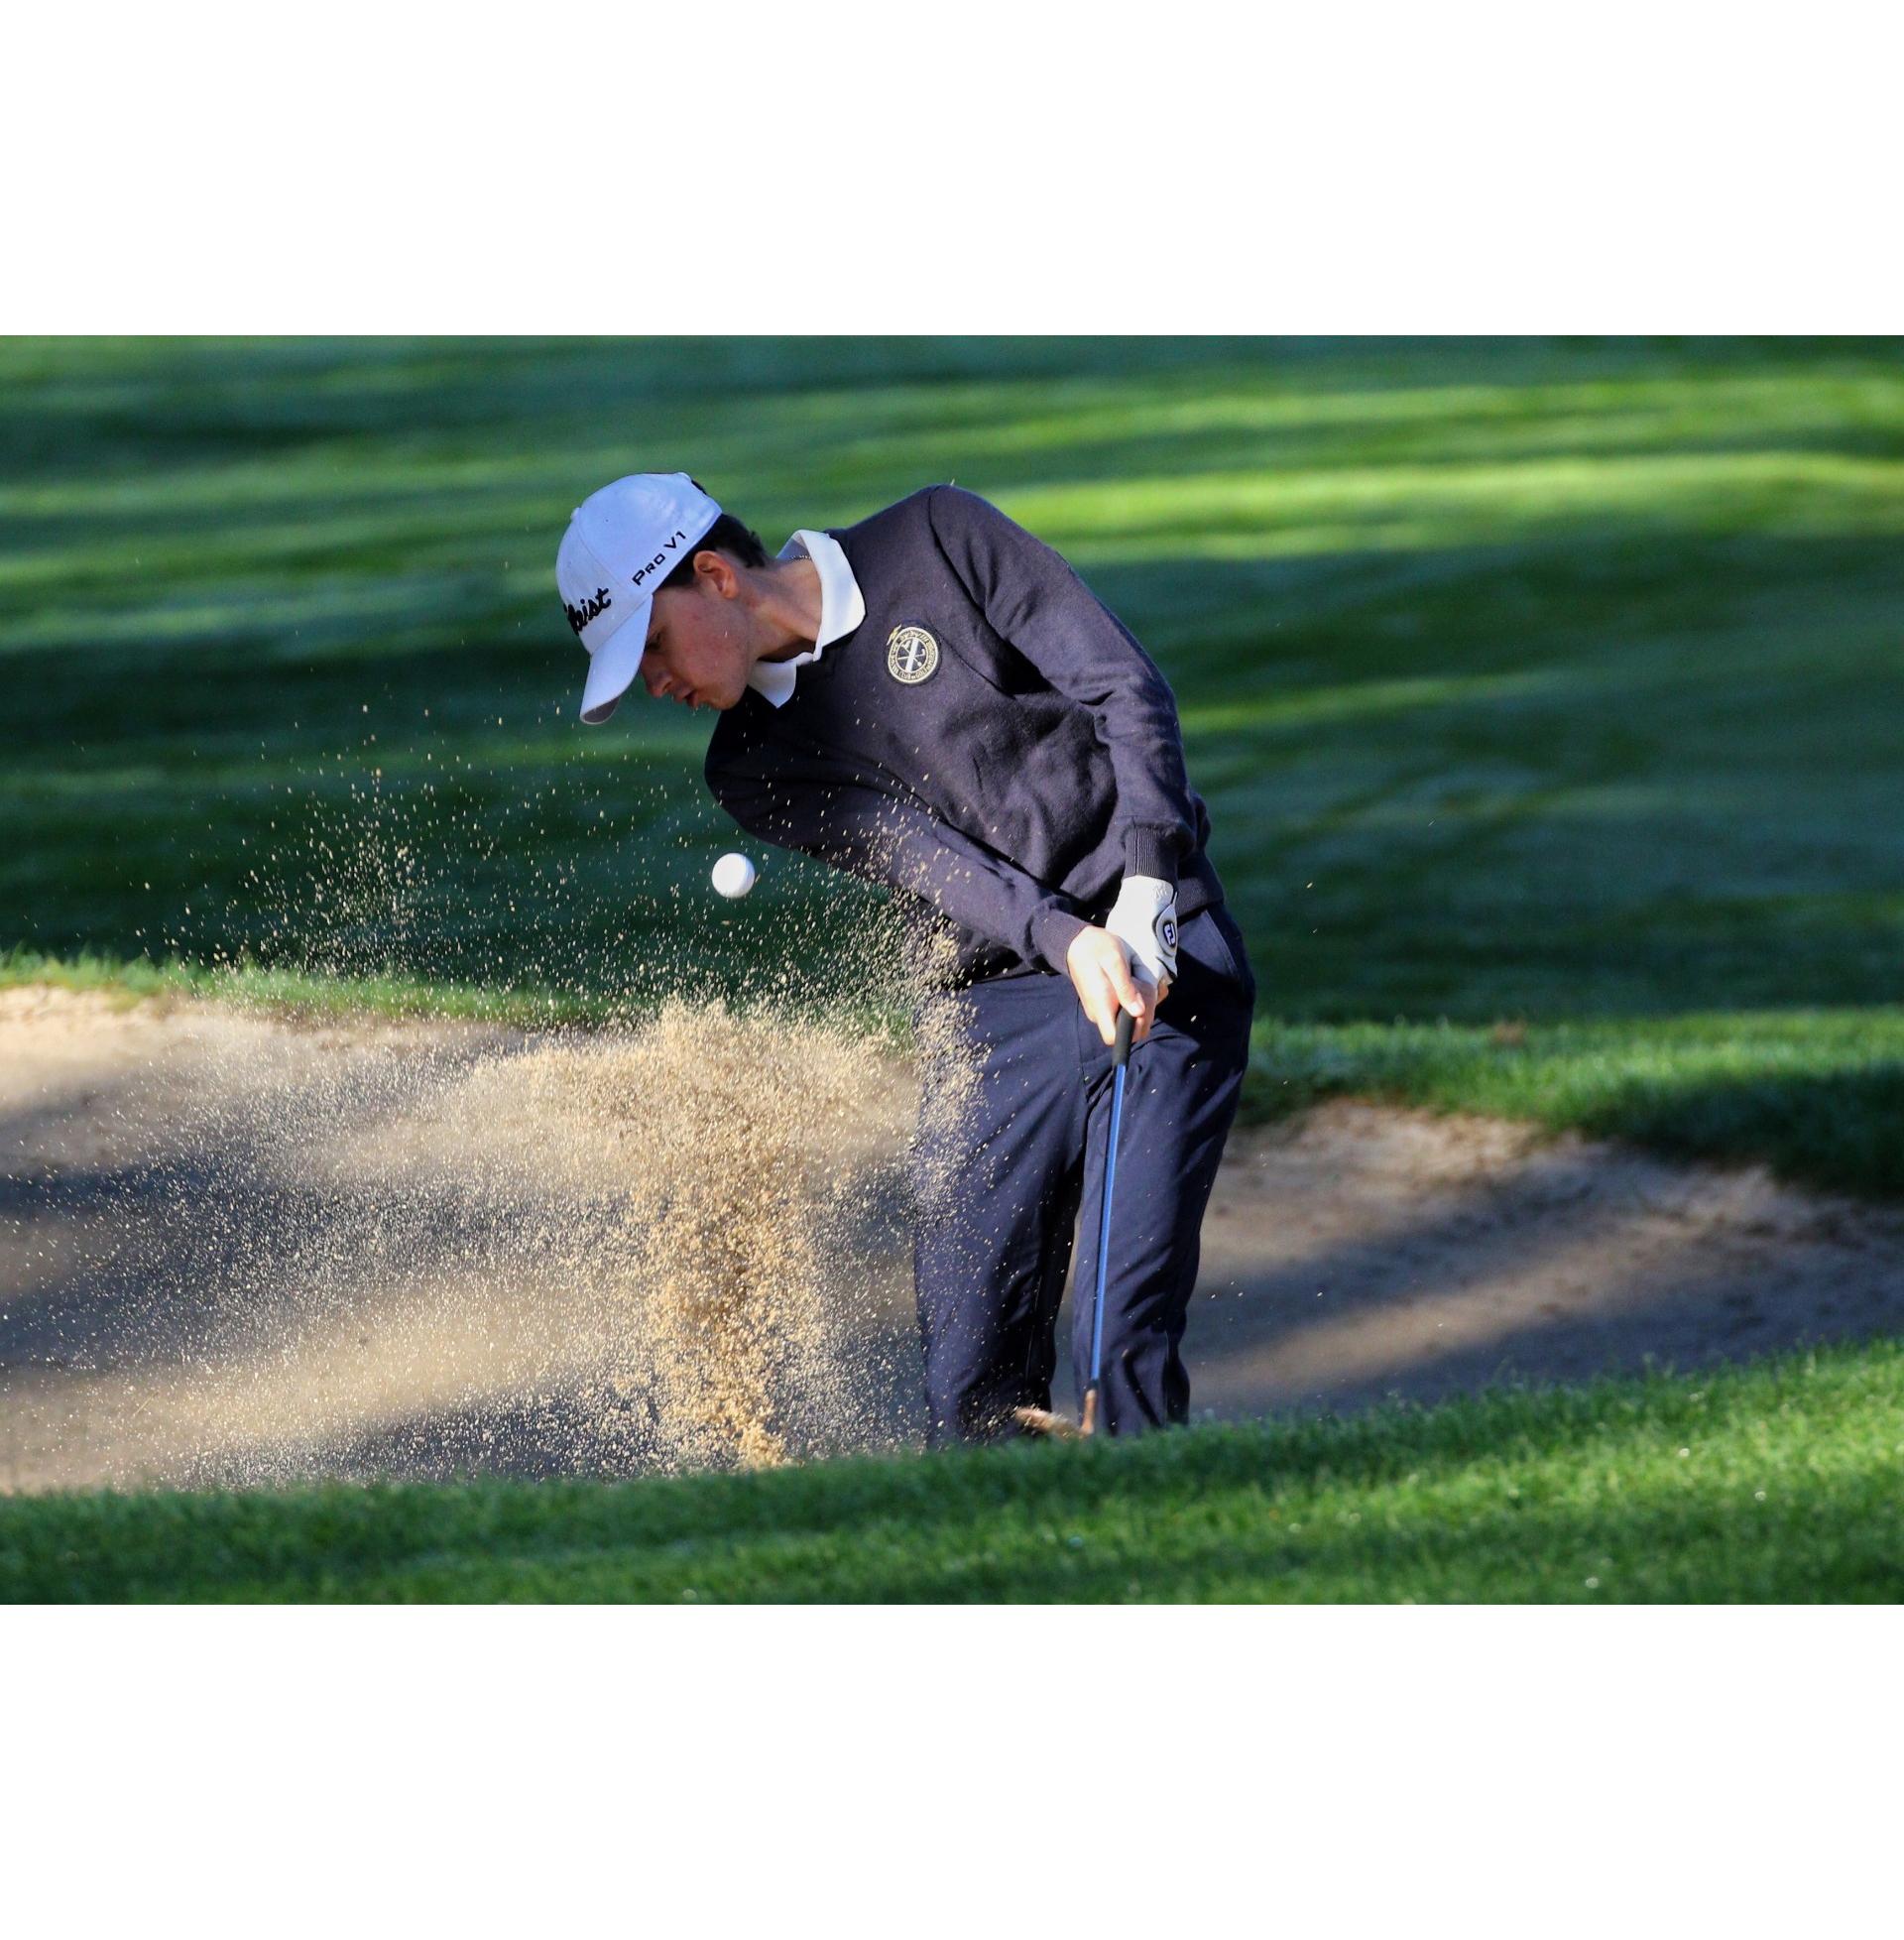 U.S. Amateur Championship – Dani joga play-off para seguir em frente